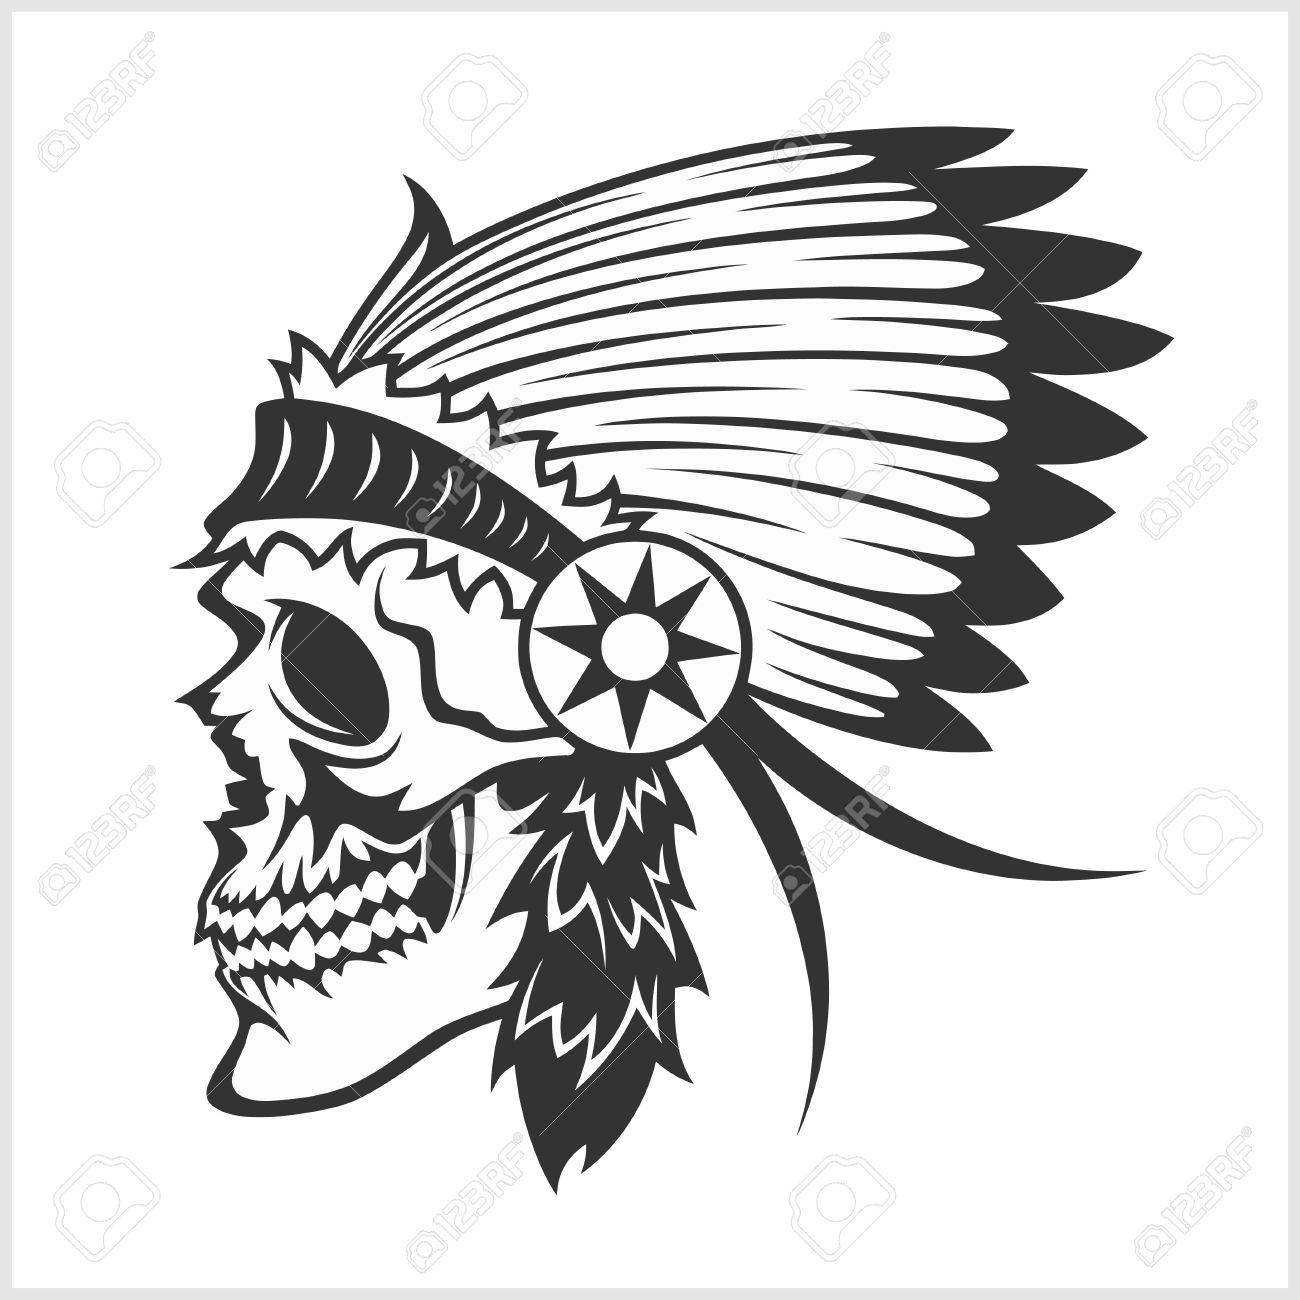 1300x1300 Native American Indian Chief Headdress